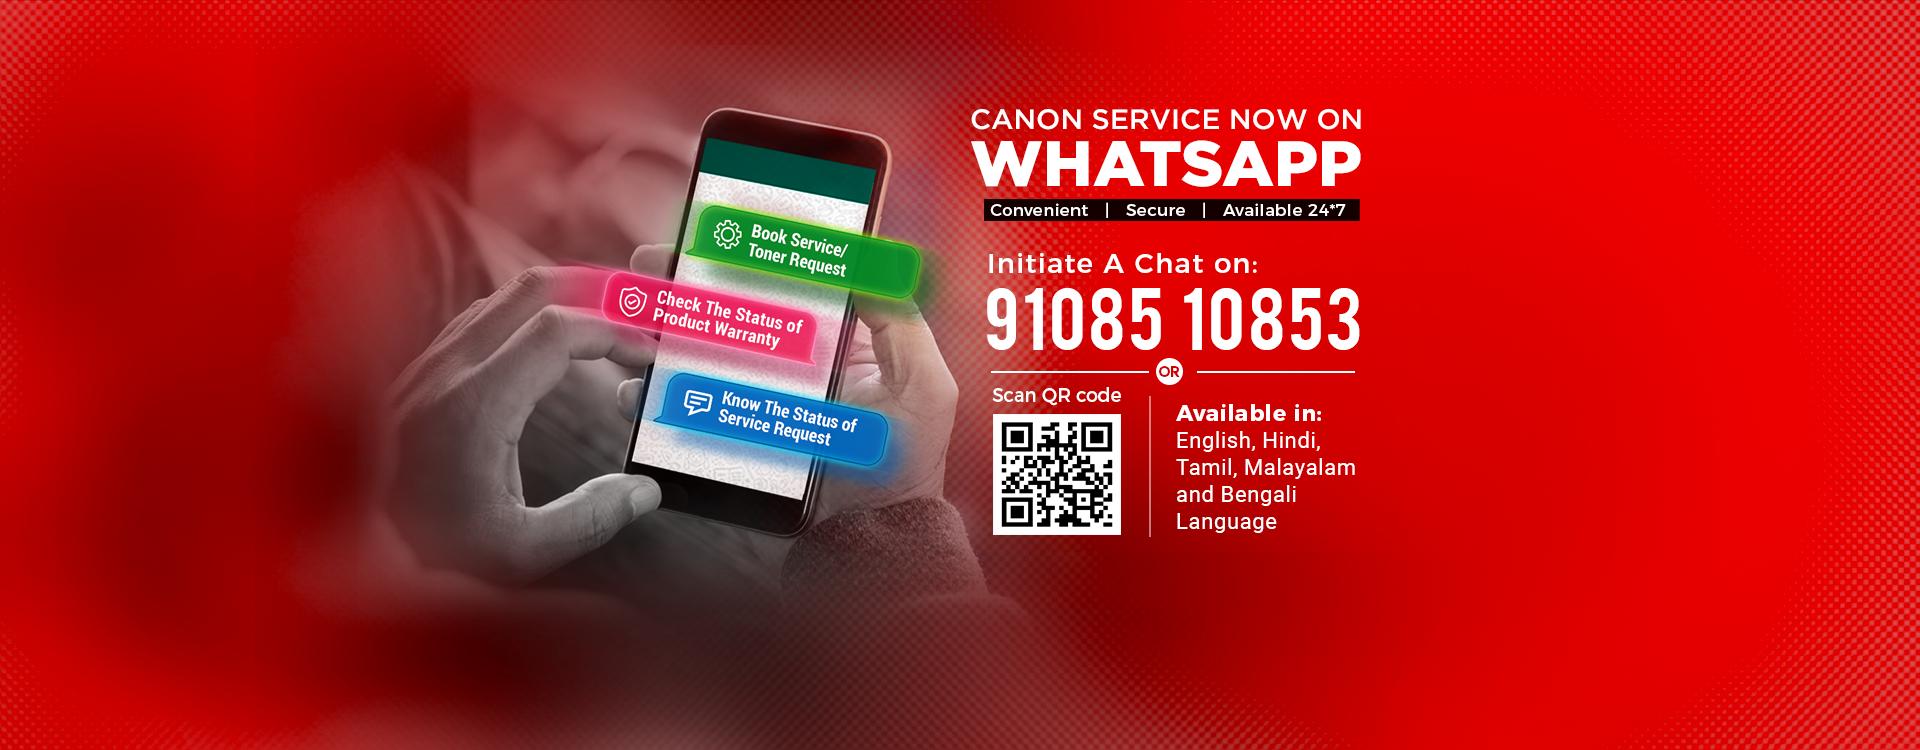 Whatsapp_banner_1920-x-750